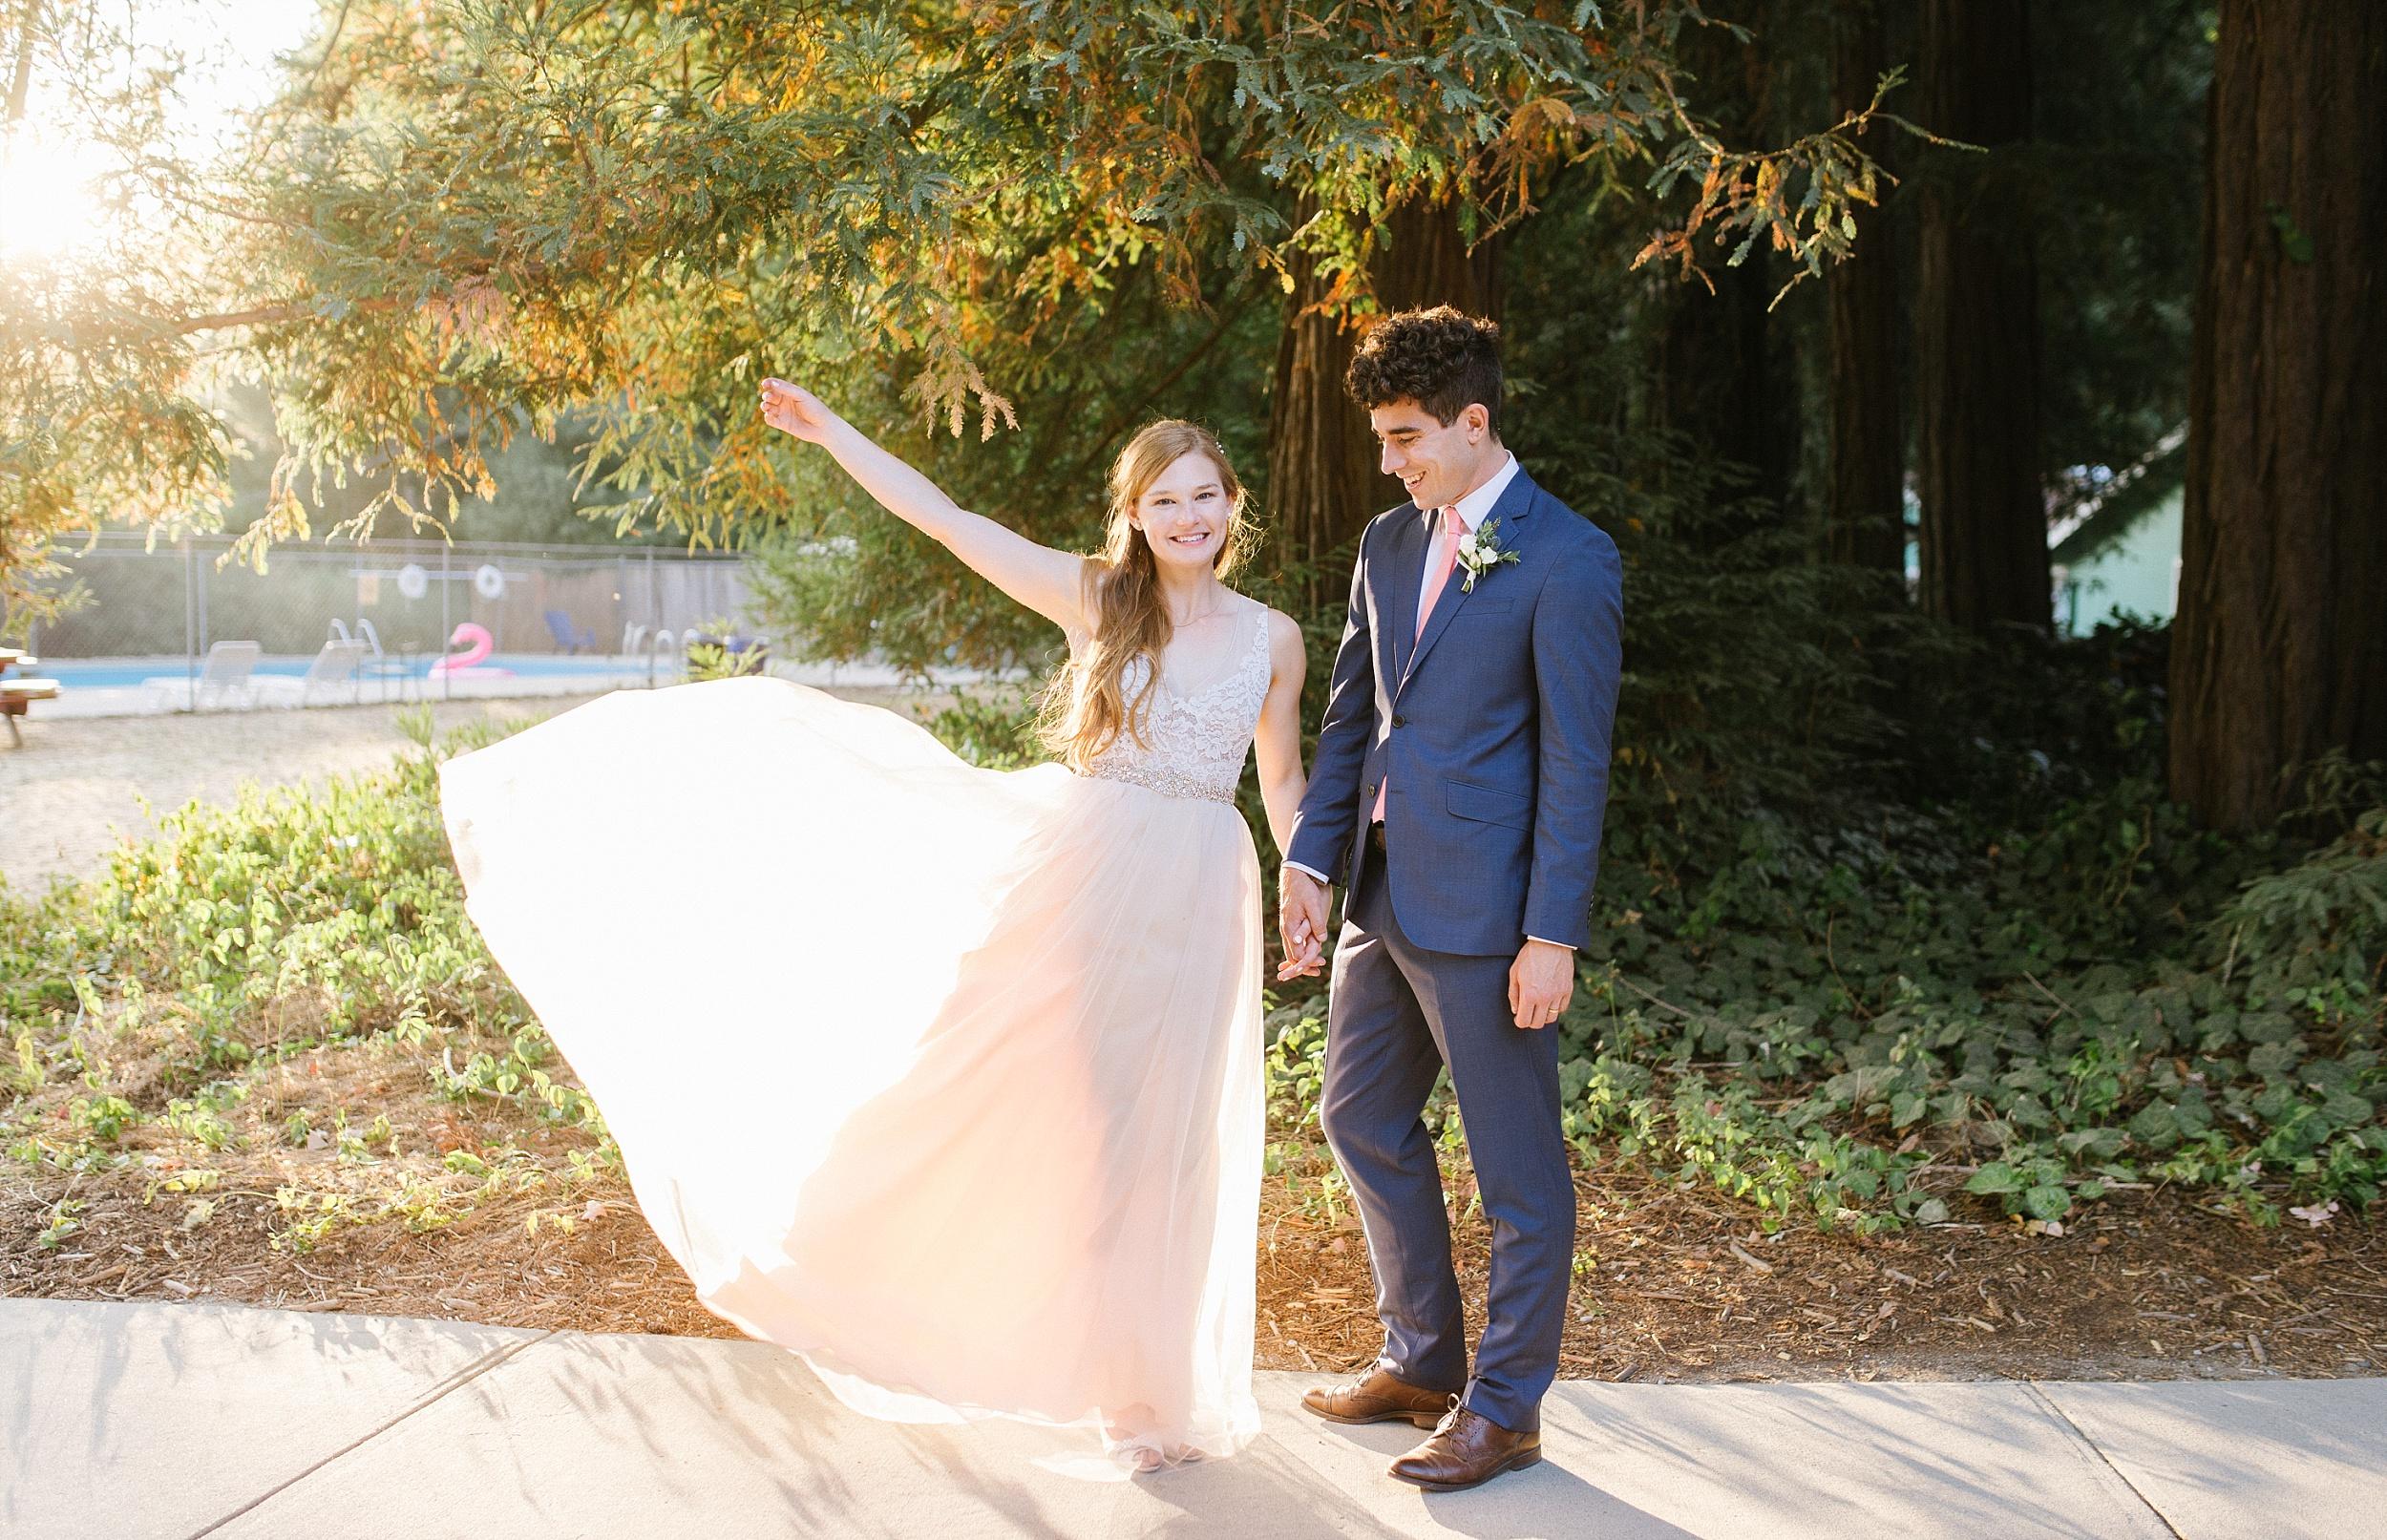 Amphitheatre-of-the-Redwoods-wedding-erikariley_chelsea-dier-photography_0036.jpg